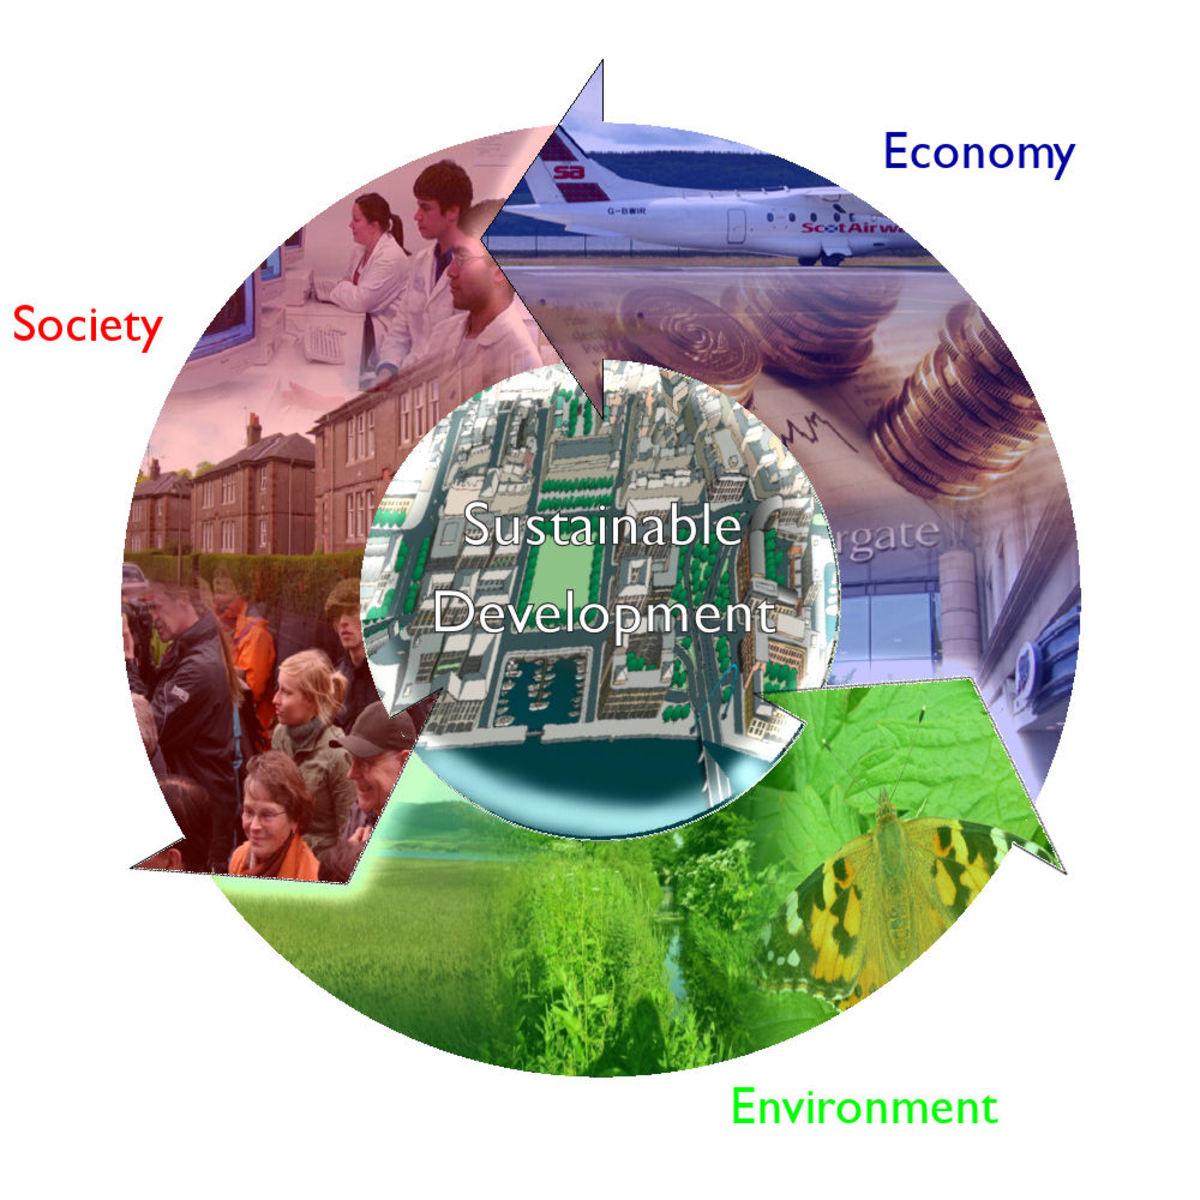 sustainabledevelopment